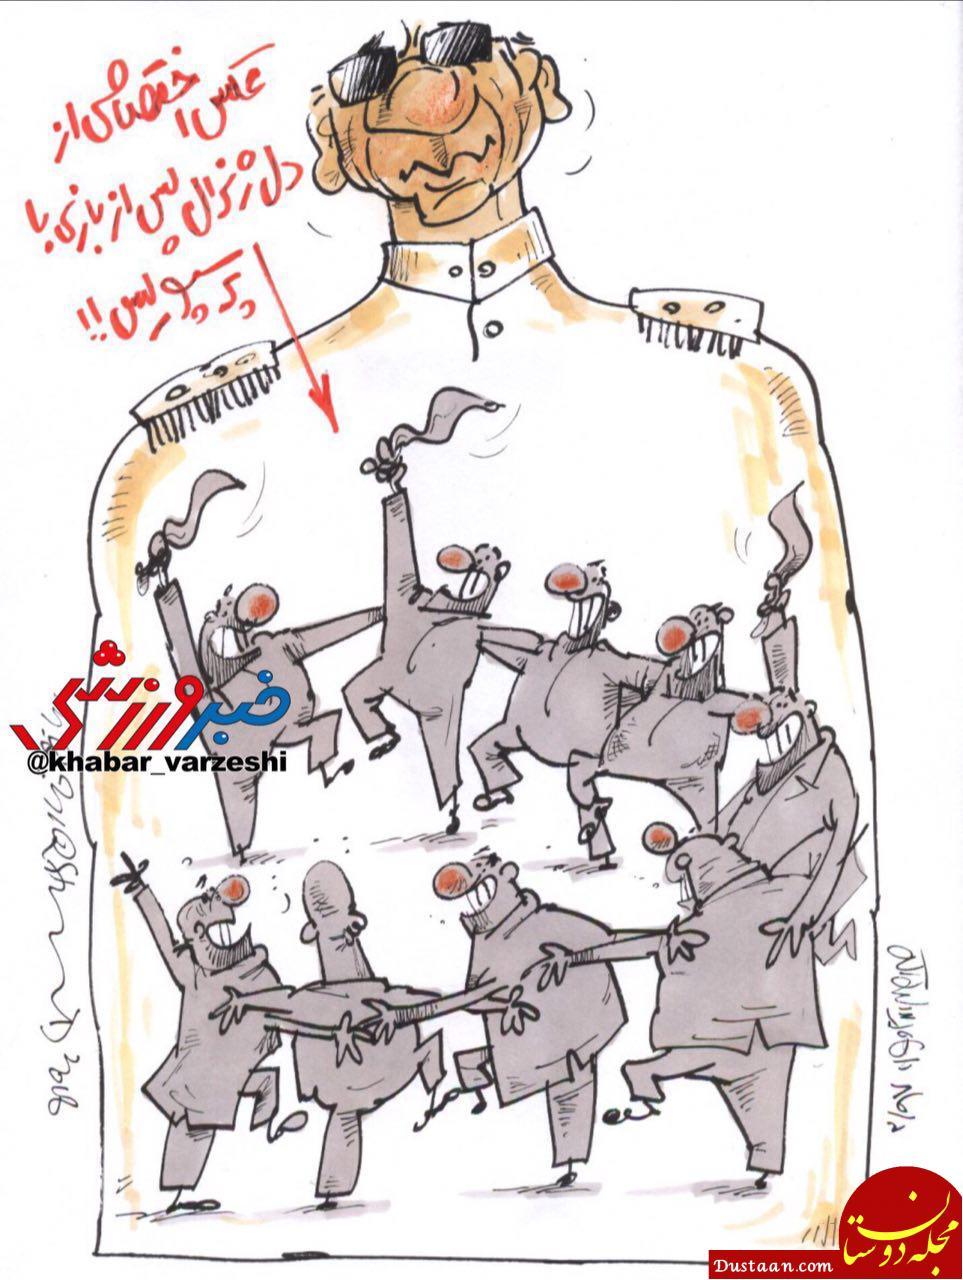 www.dustaan.com قلعه نویی: دلم از بردن پرسپولیس سوخت! +عکس